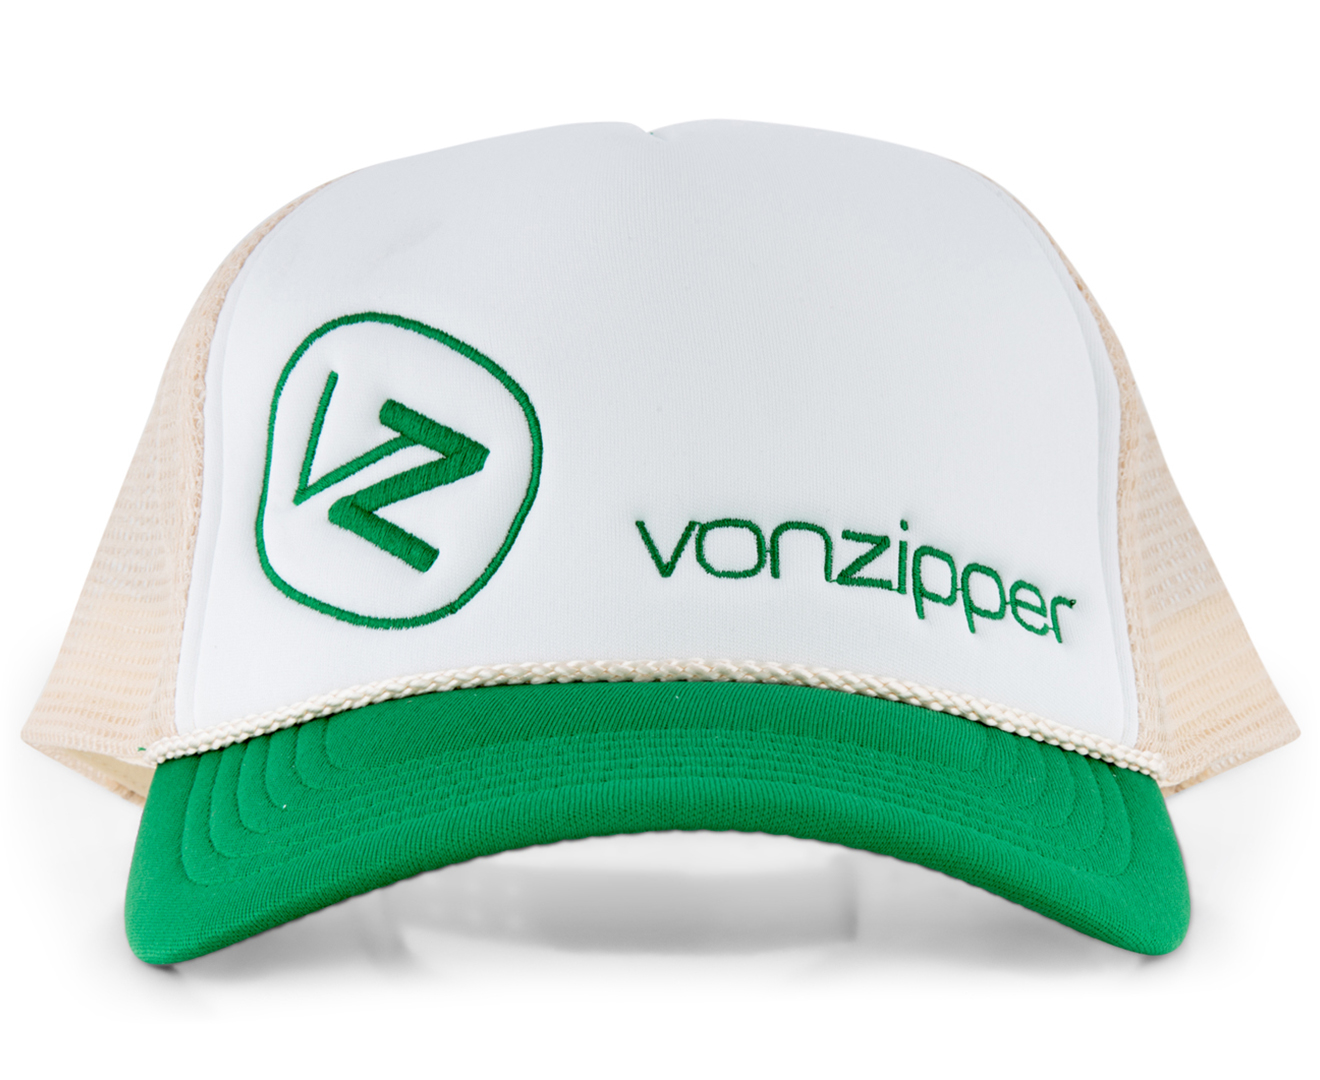 VonZipper Moby Two Tone Trucker Cap - Teal  9c8aa702c71